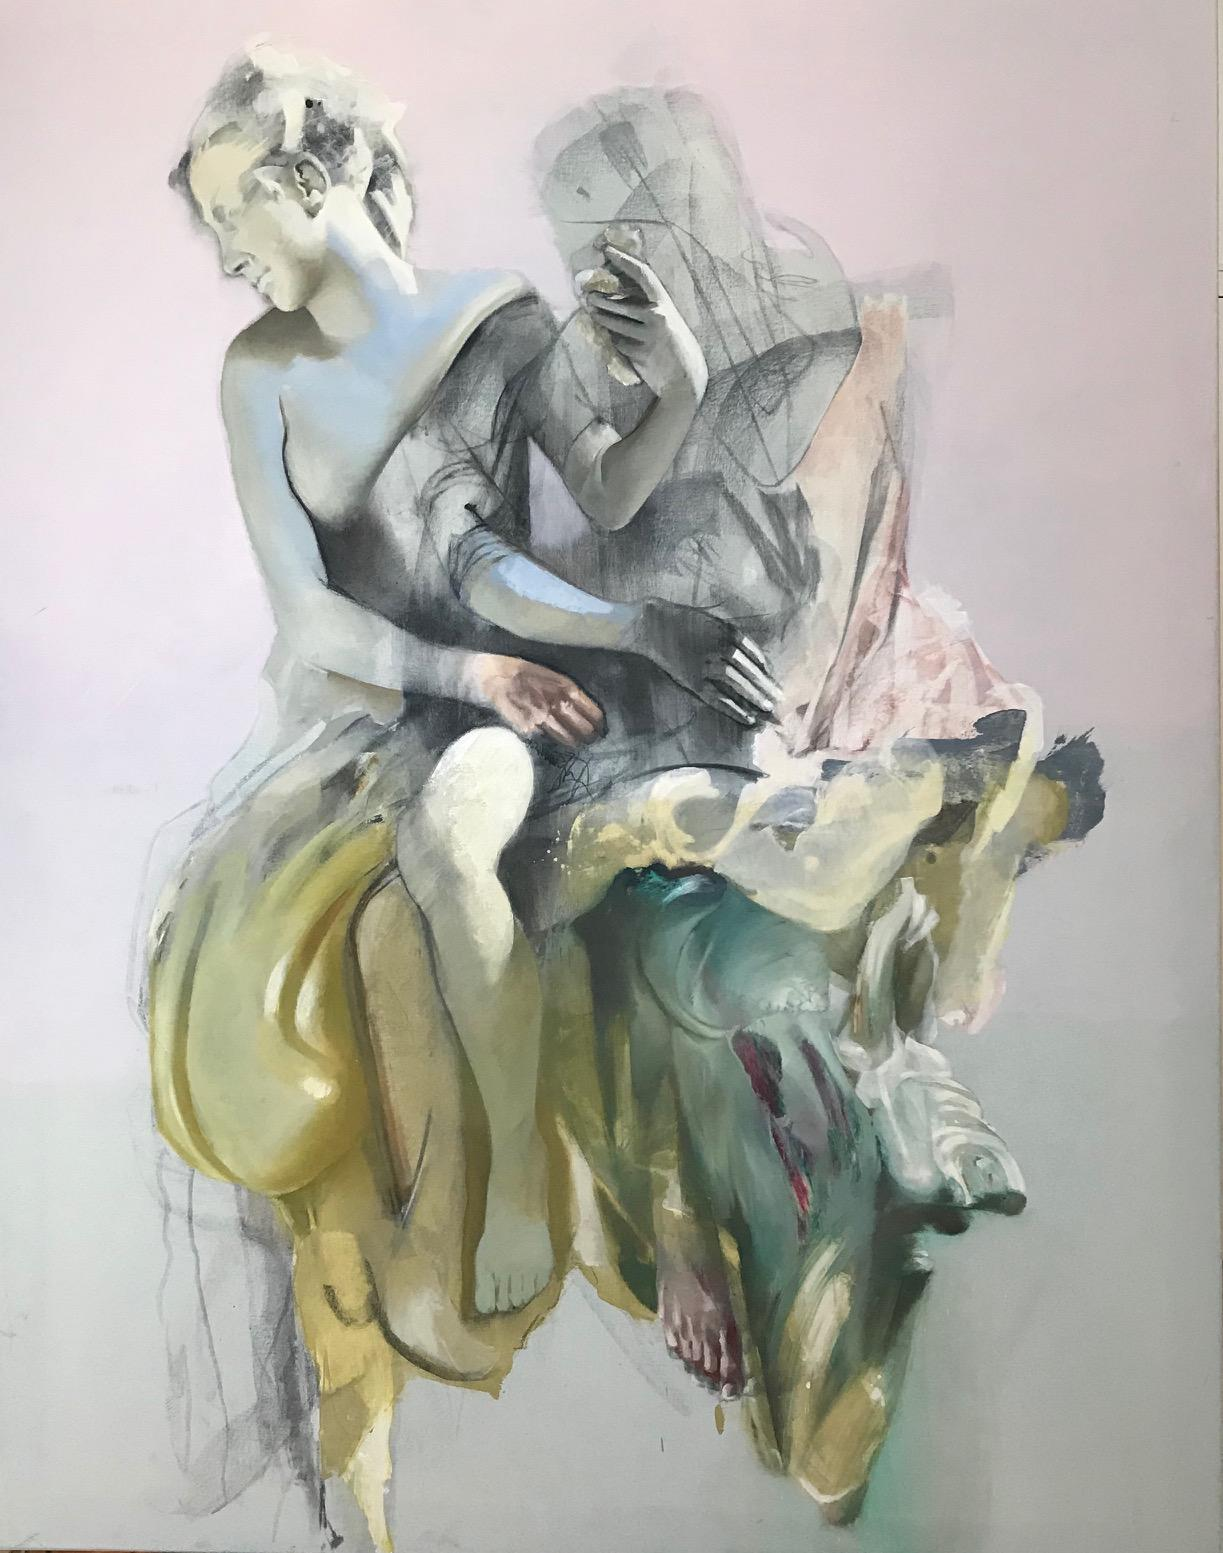 La Invités, Contemporary Abstract Oil Painting Canvas Sculpture Pink Fine Art